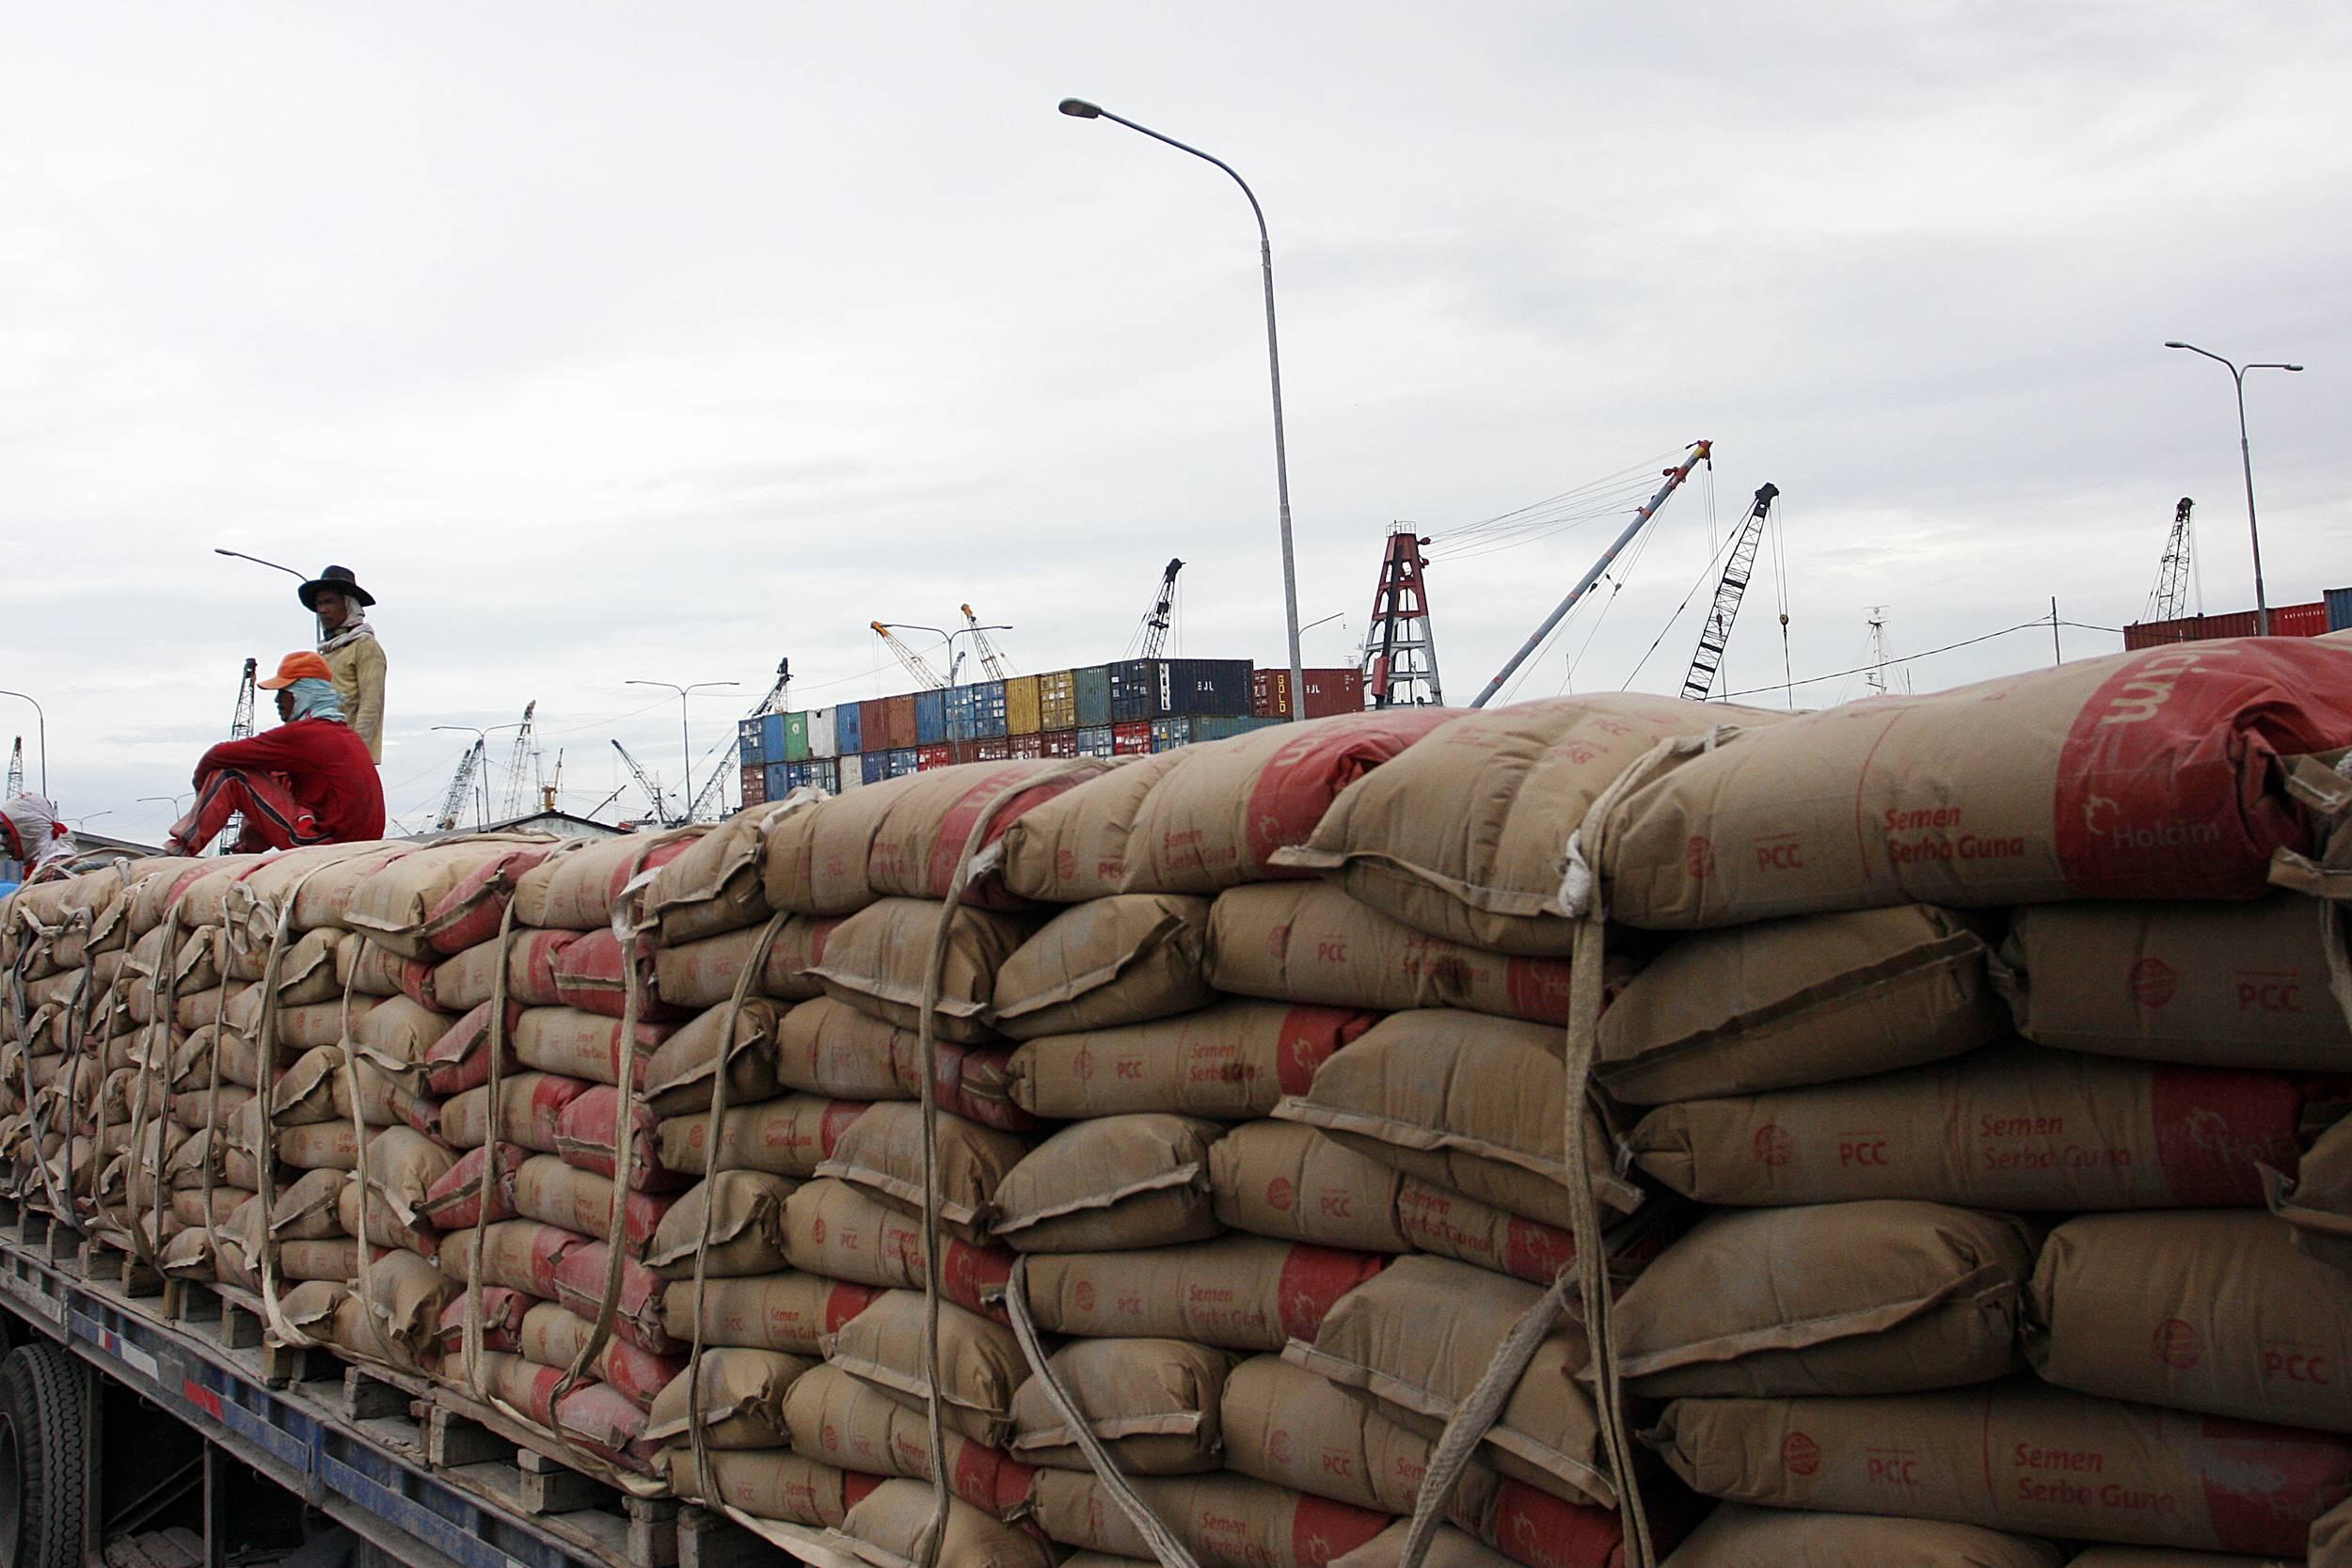 Kenaikan Beban Penjualan, Laba Semen Indonesia Turun 11%